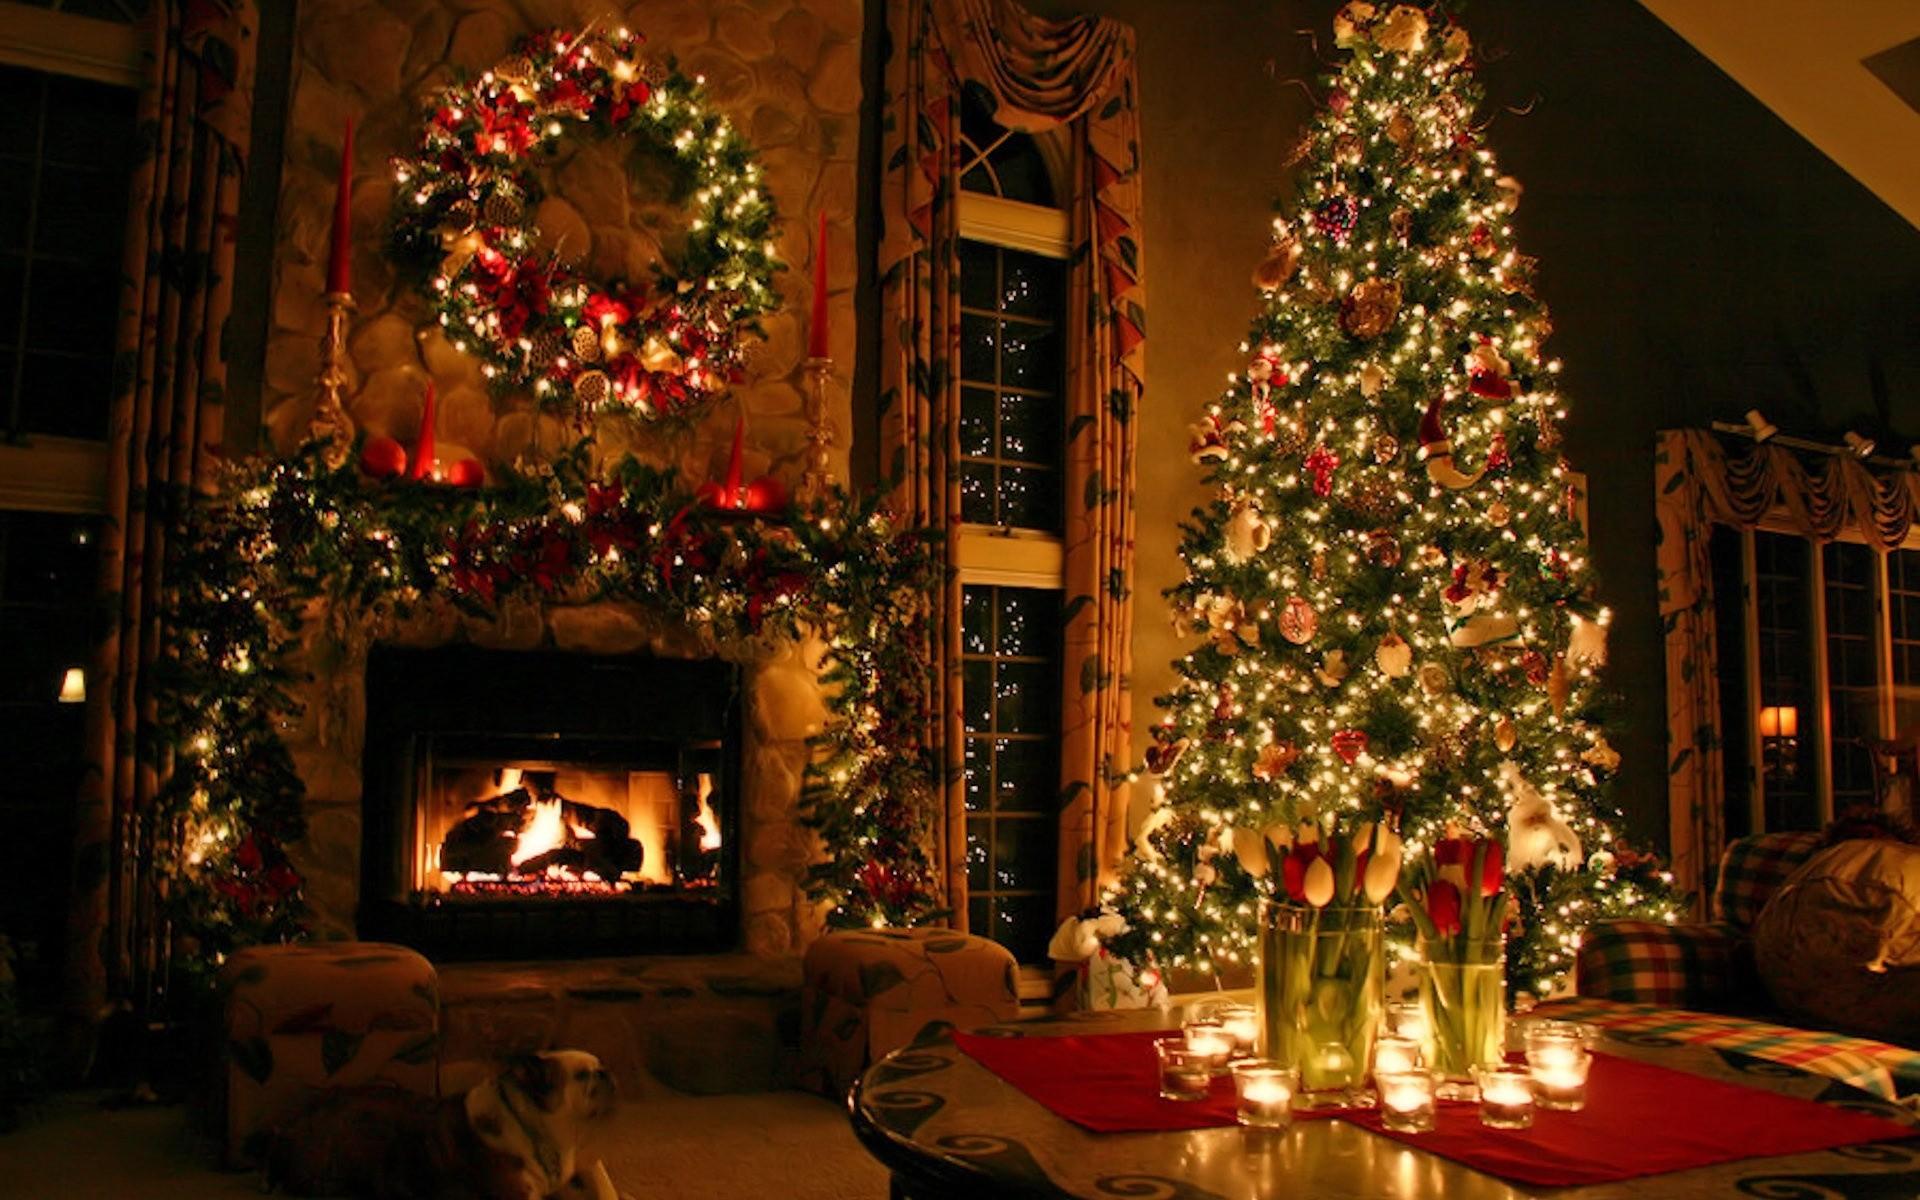 hd_christmas_wallpaper we wish you a merry christmas - Happy Christmas Harry